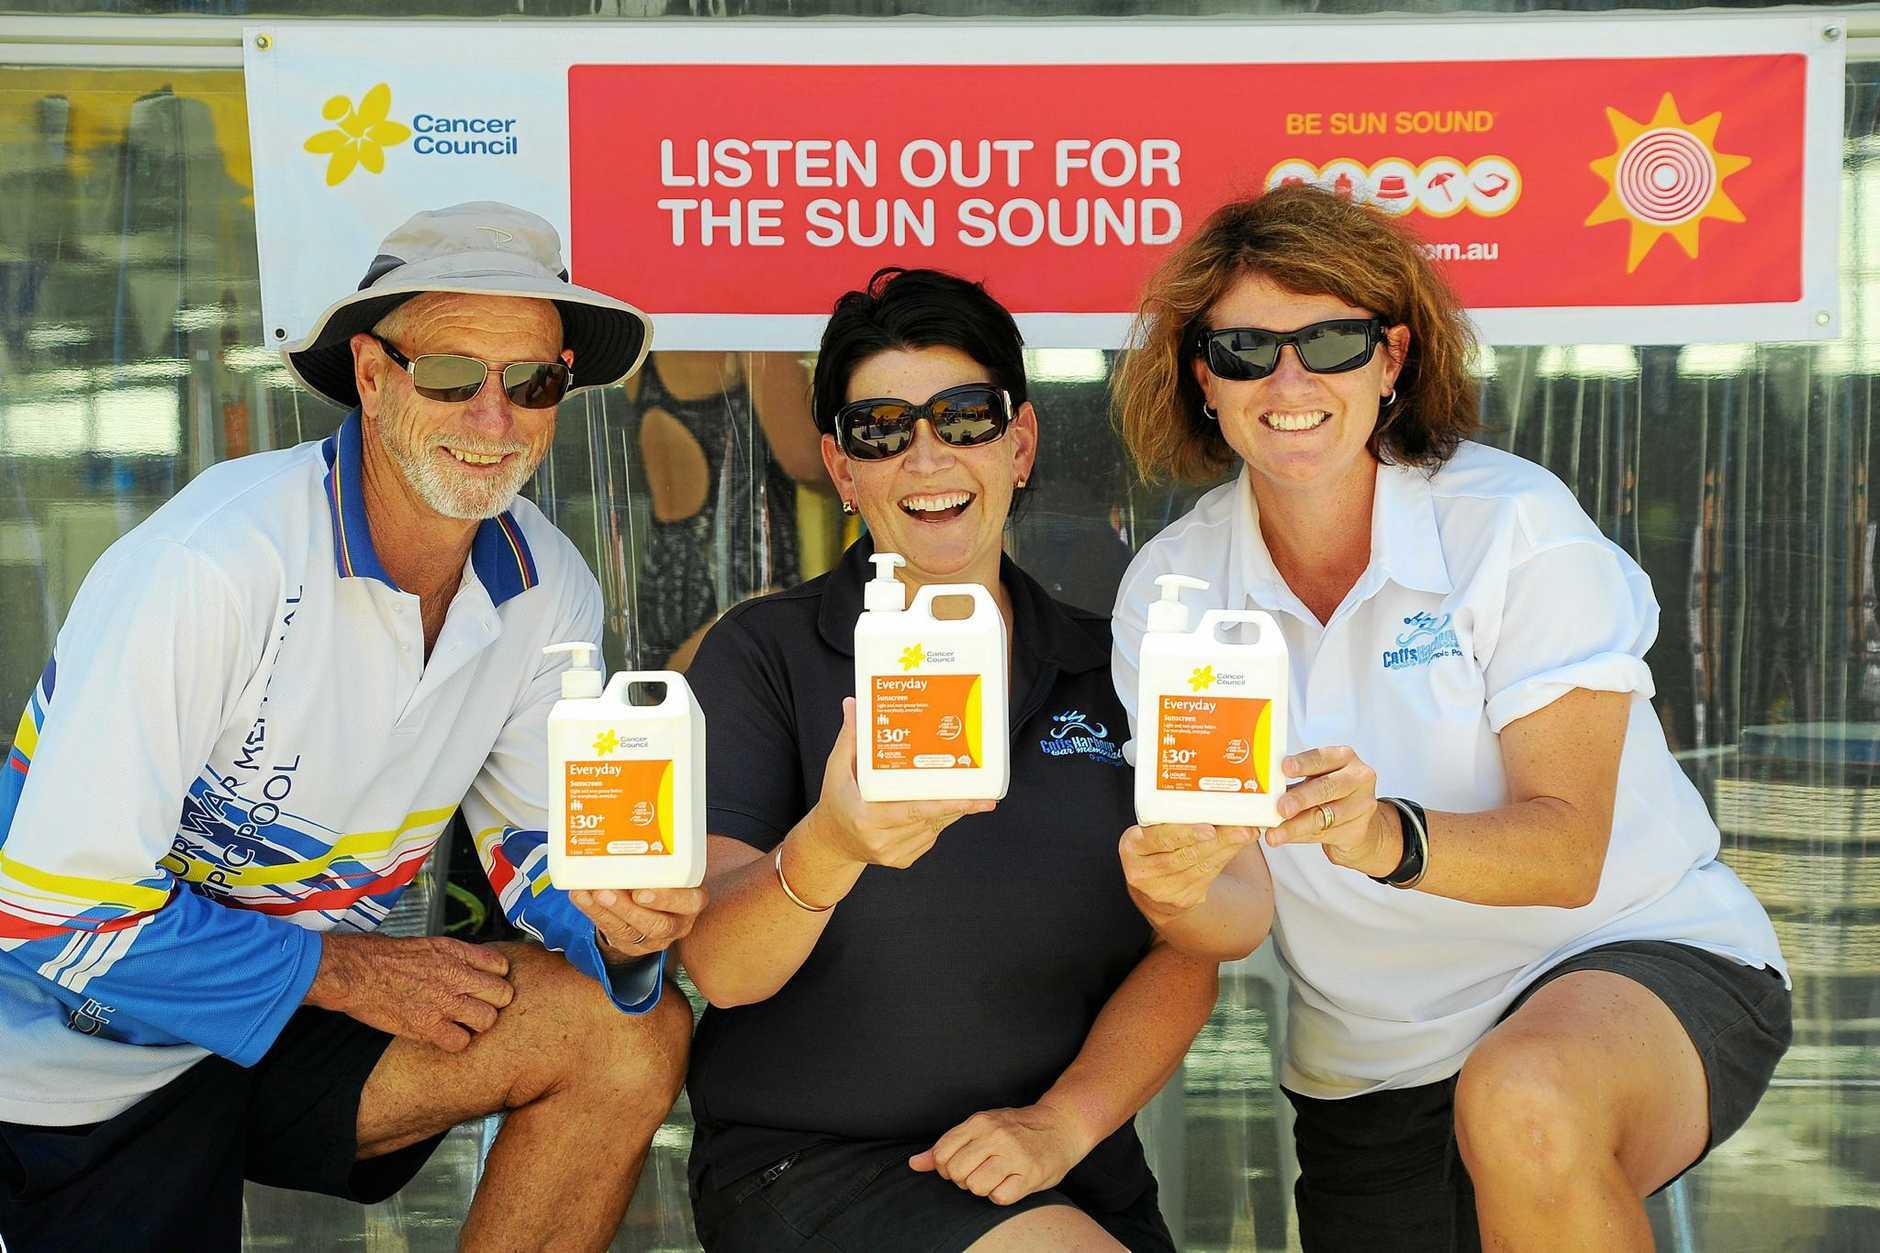 SLIP, SLOP SLAP: Coffs Harbour Memorial Pool Lifeguard Jeff Porter, manager Kerri-Ann McLaughlin and swim coach Kim Roach call for sun safety this week.